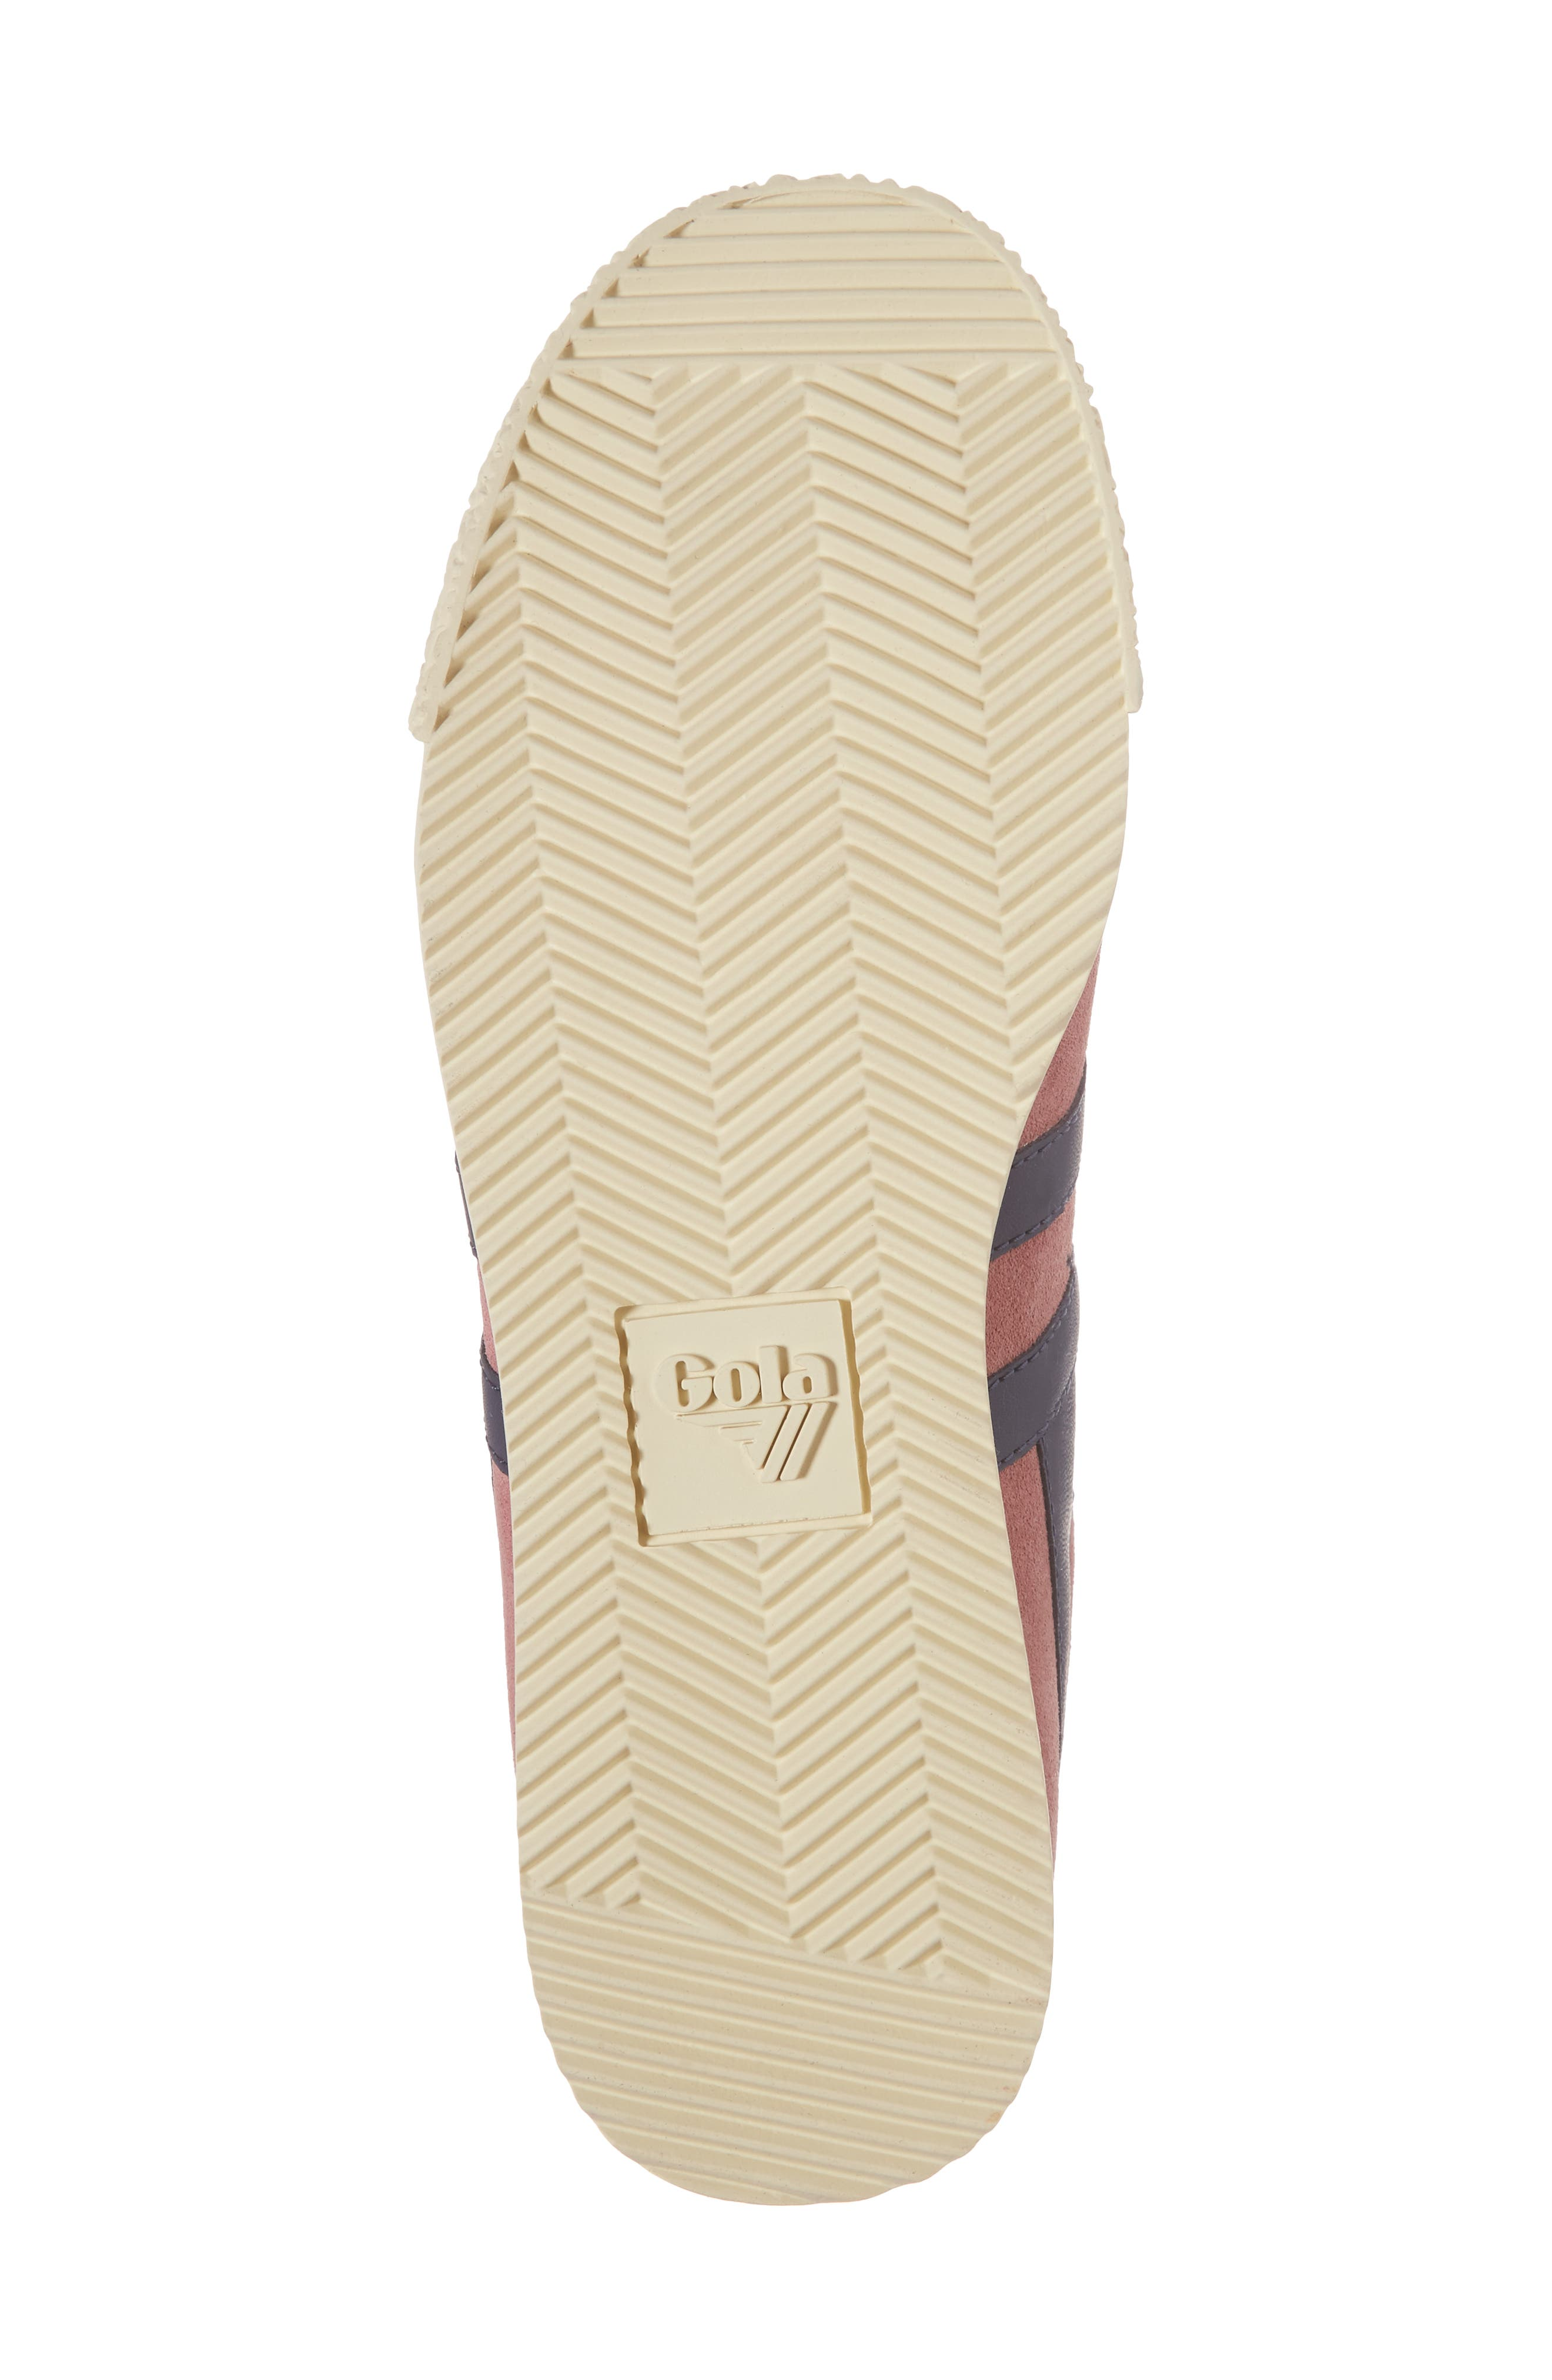 Harrier Suede Low Top Sneaker,                             Alternate thumbnail 6, color,                             Dusty Rose/ Navy